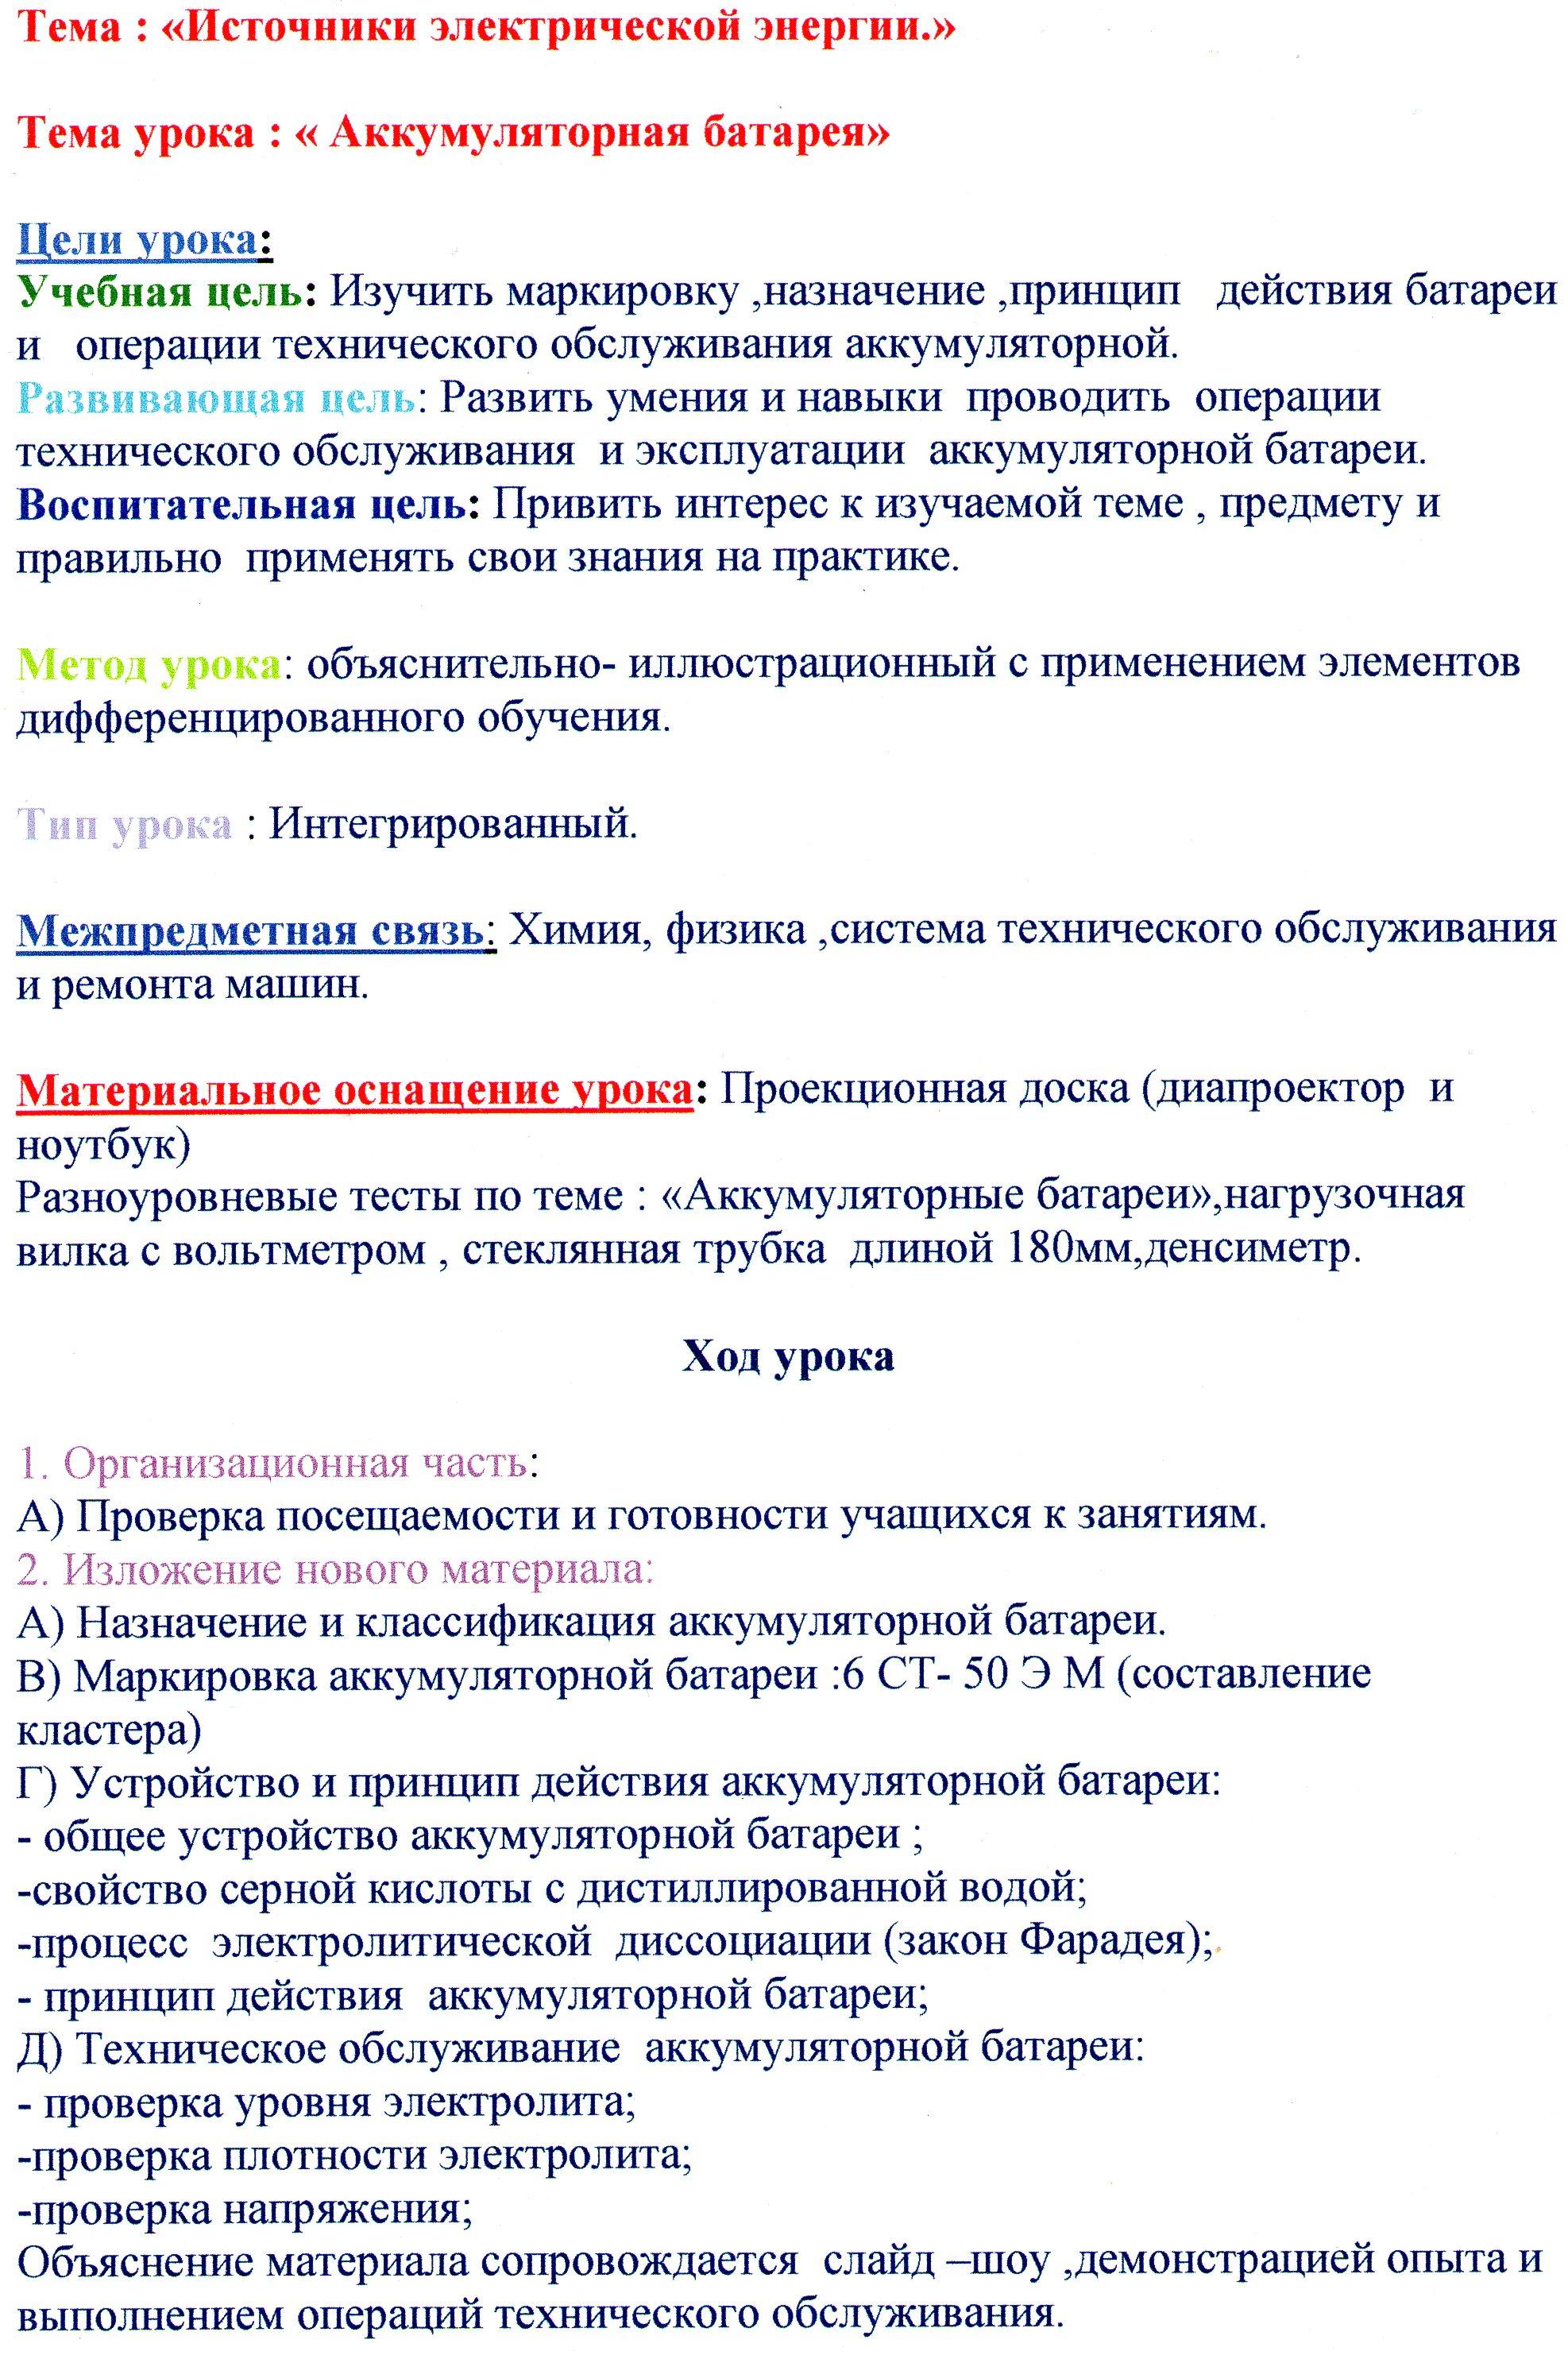 C:\Users\Василий Мельченко\Pictures\img521.jpg